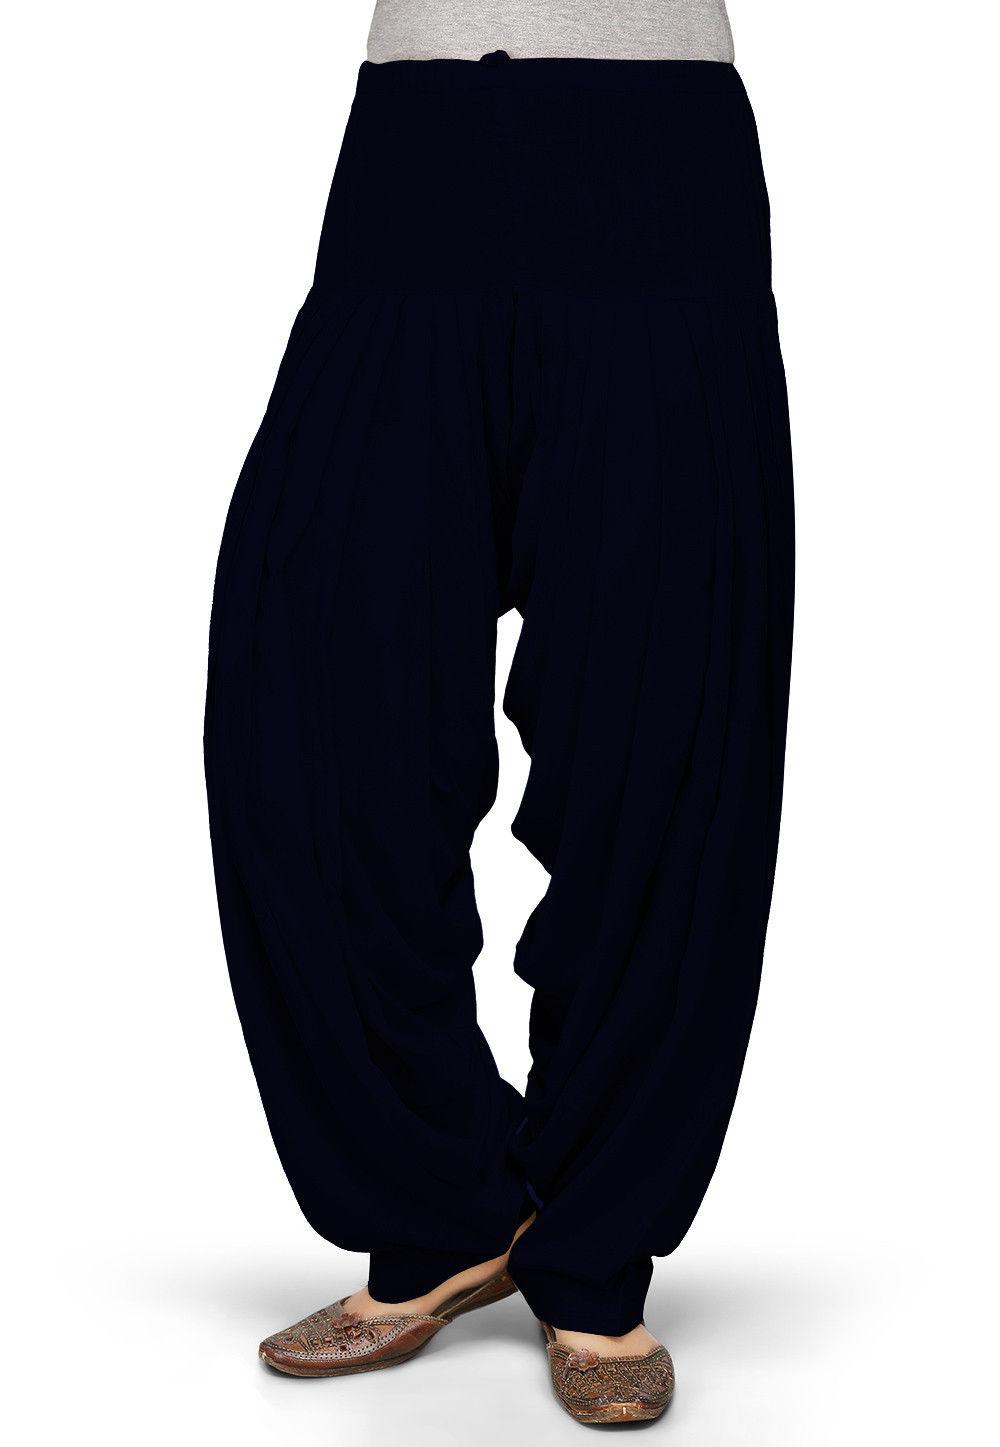 Solid Color Rayon Patiala in Black